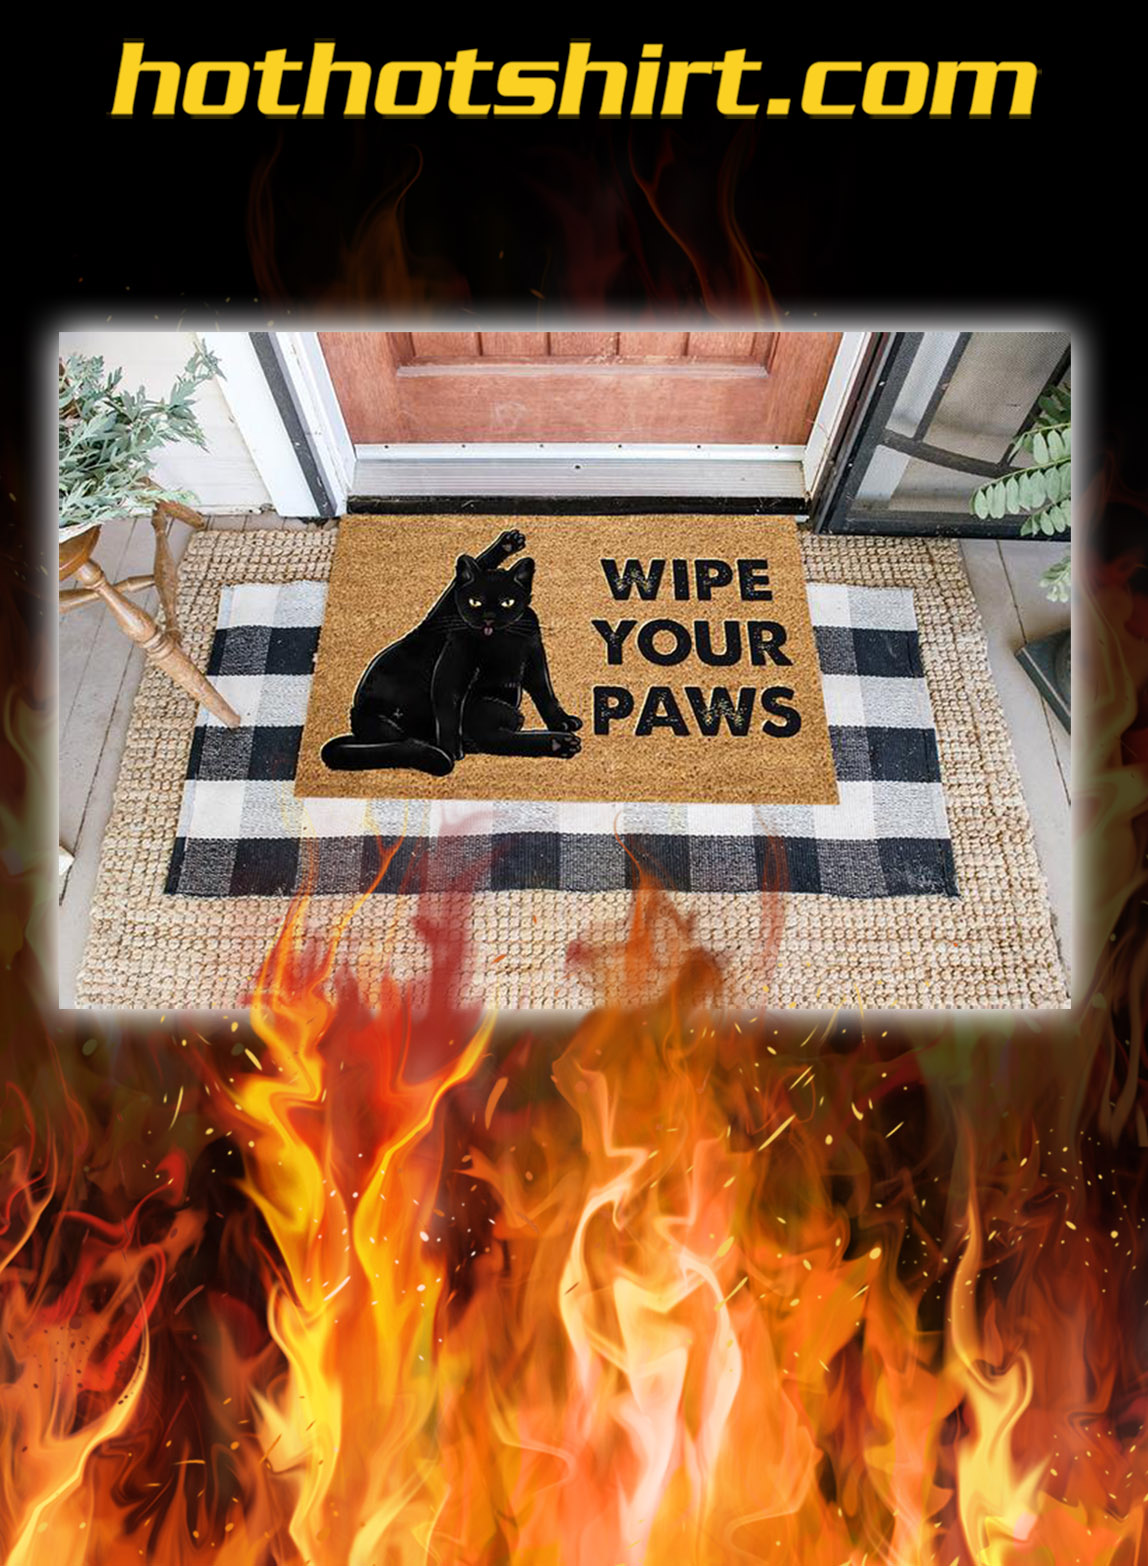 Cat wipe your paws doormat - pic 1